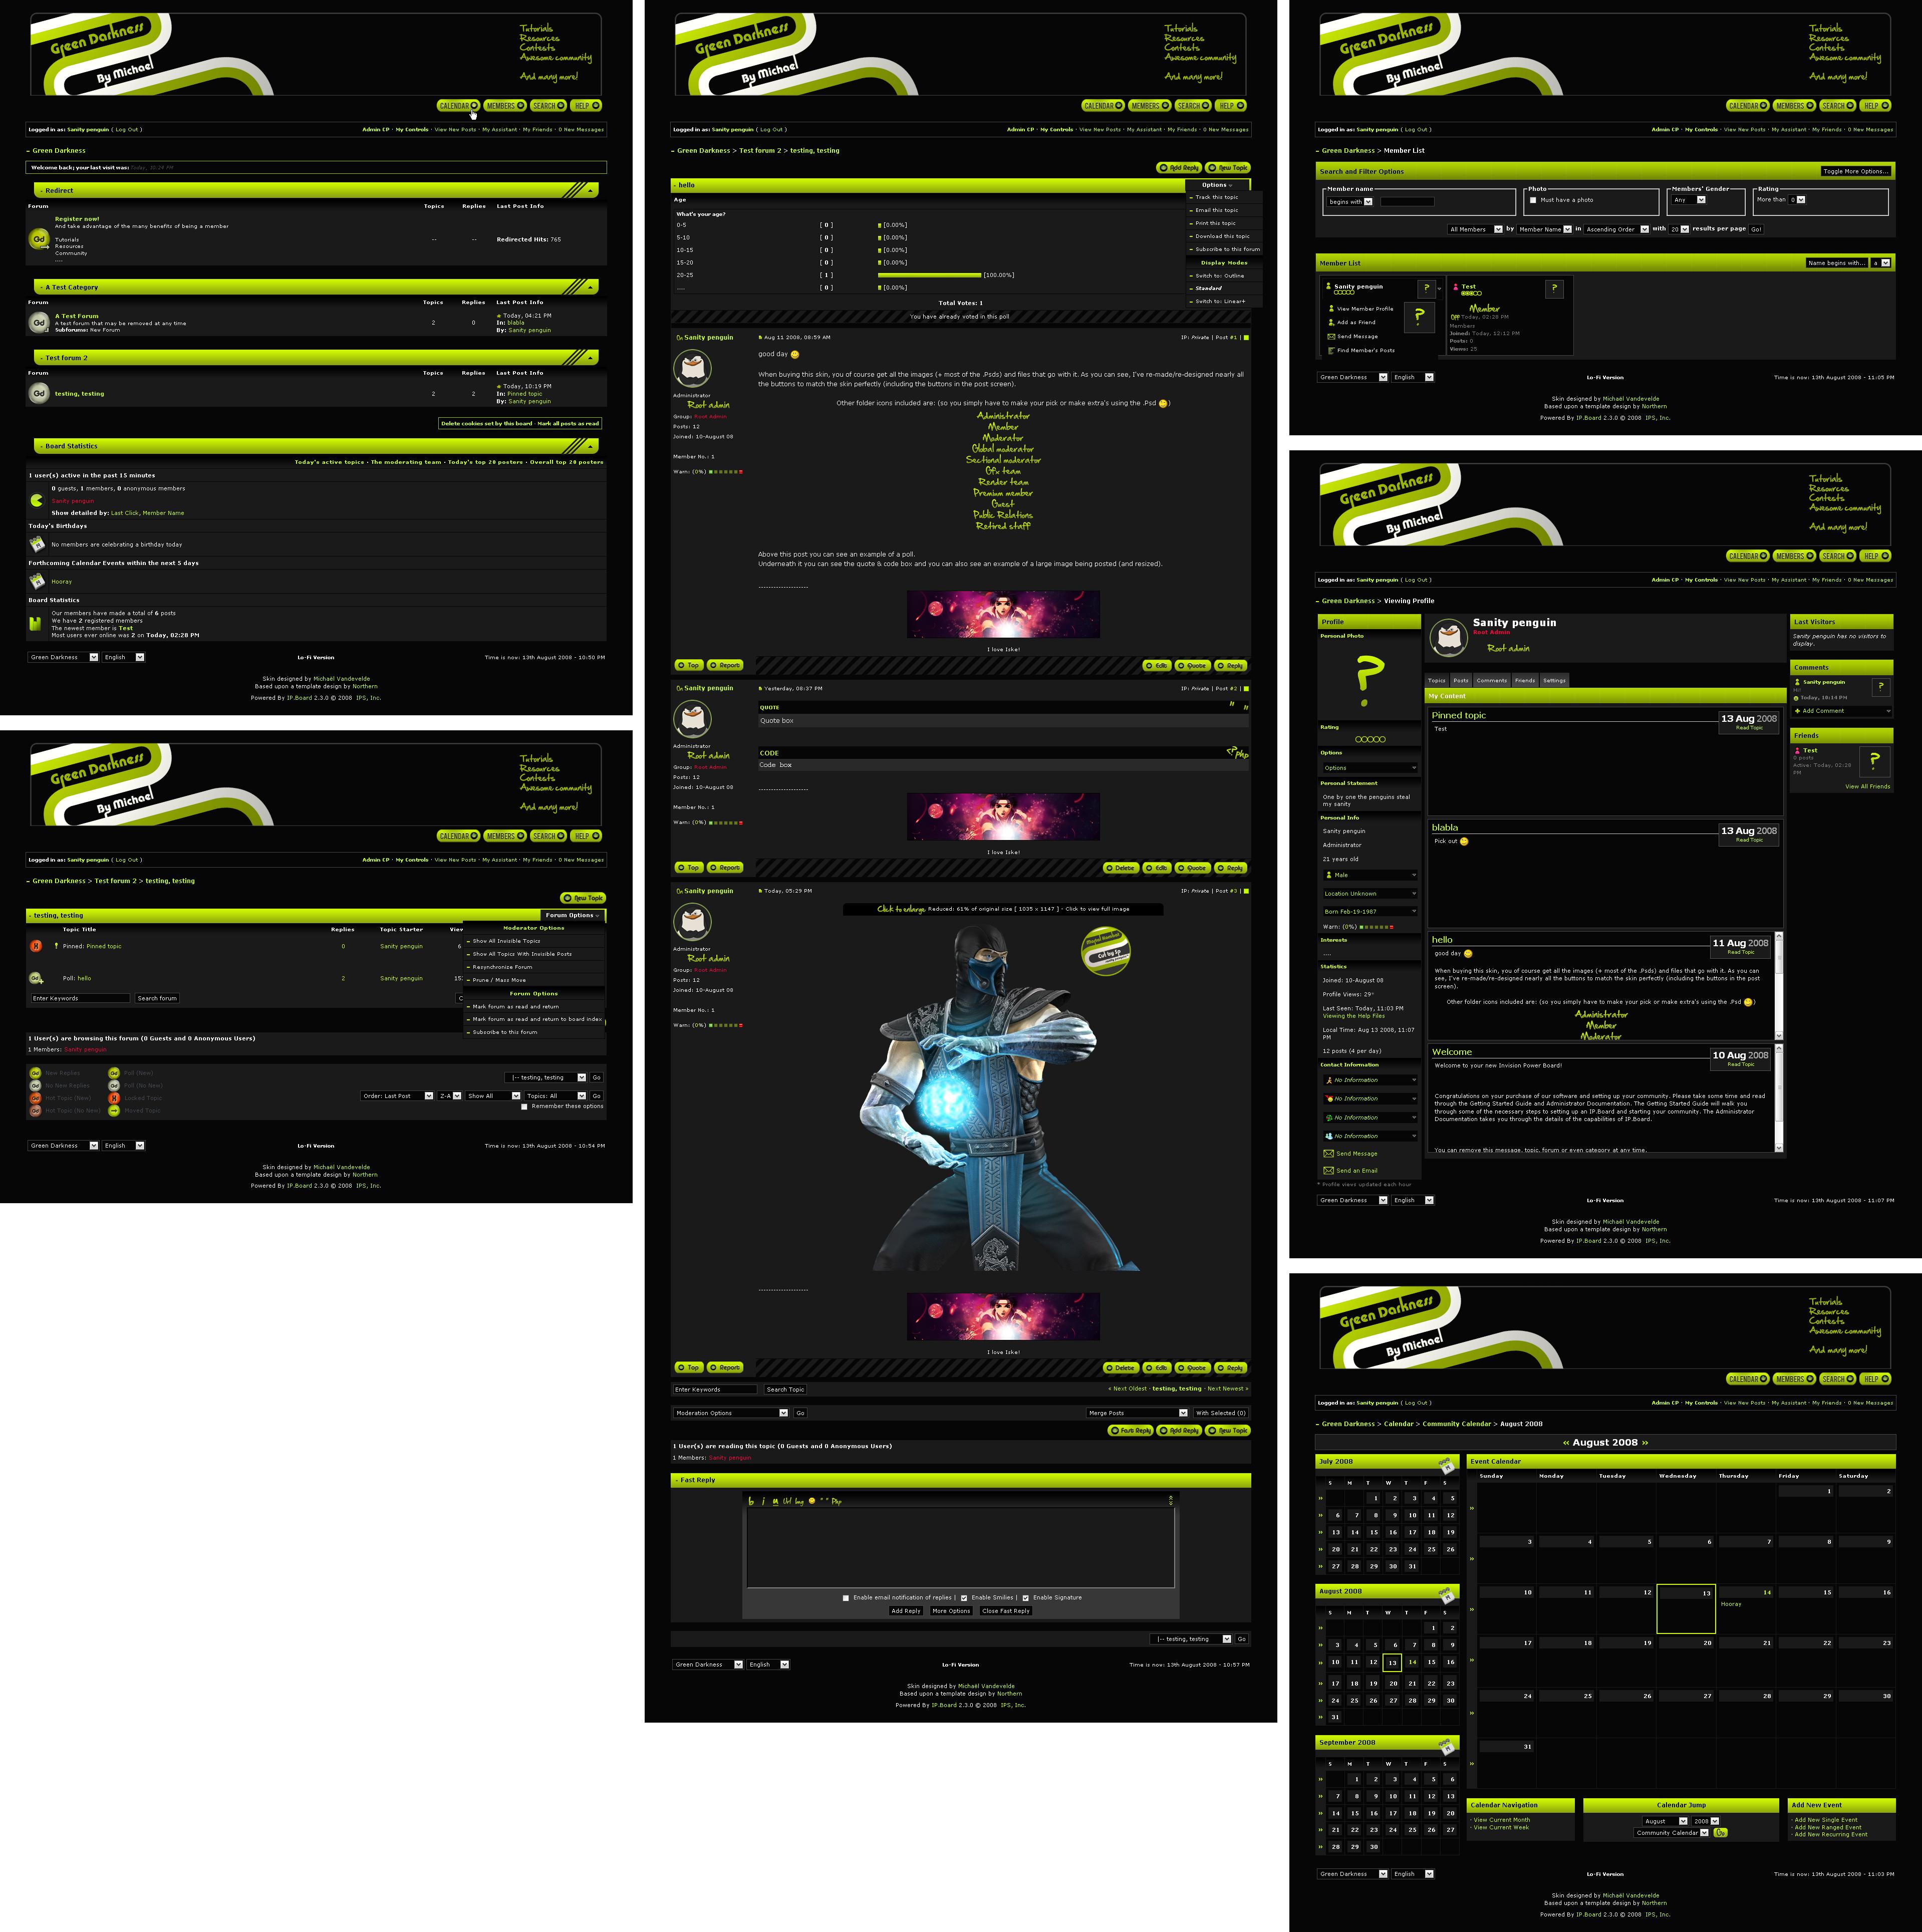 Green Darkness - Ipb forumskin by SanityP